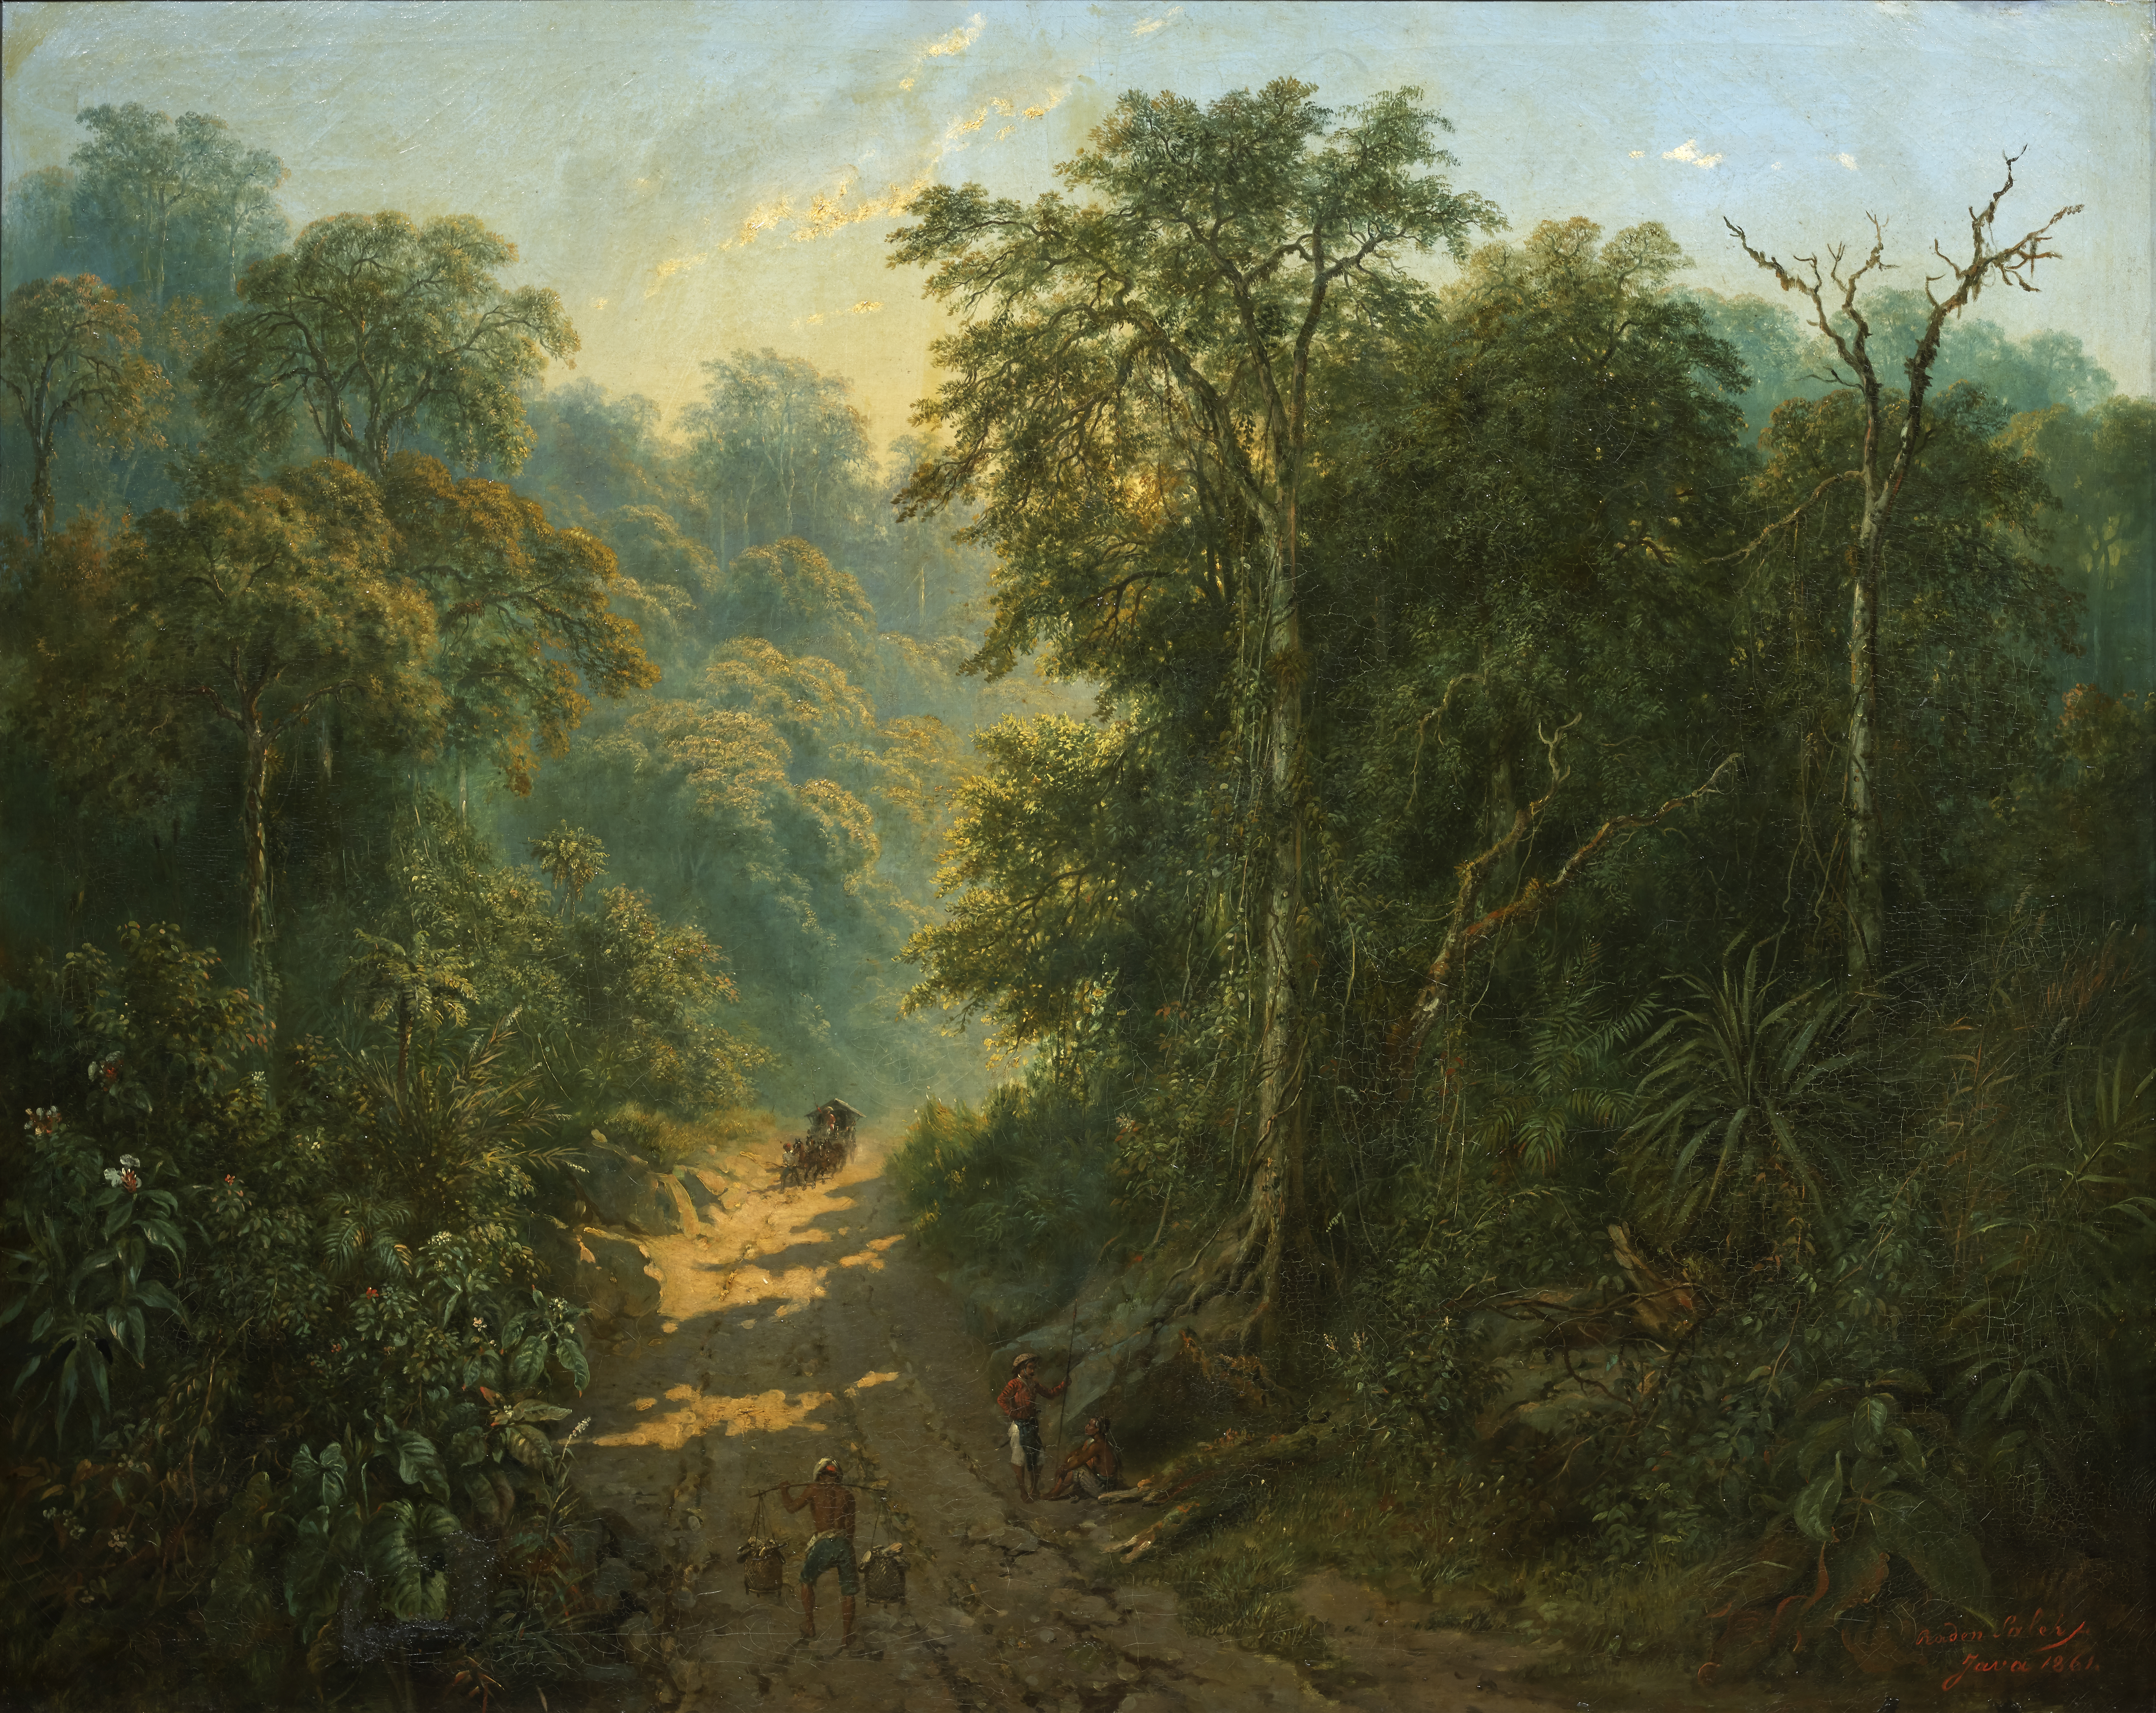 Raden Saleh (1814-1880)